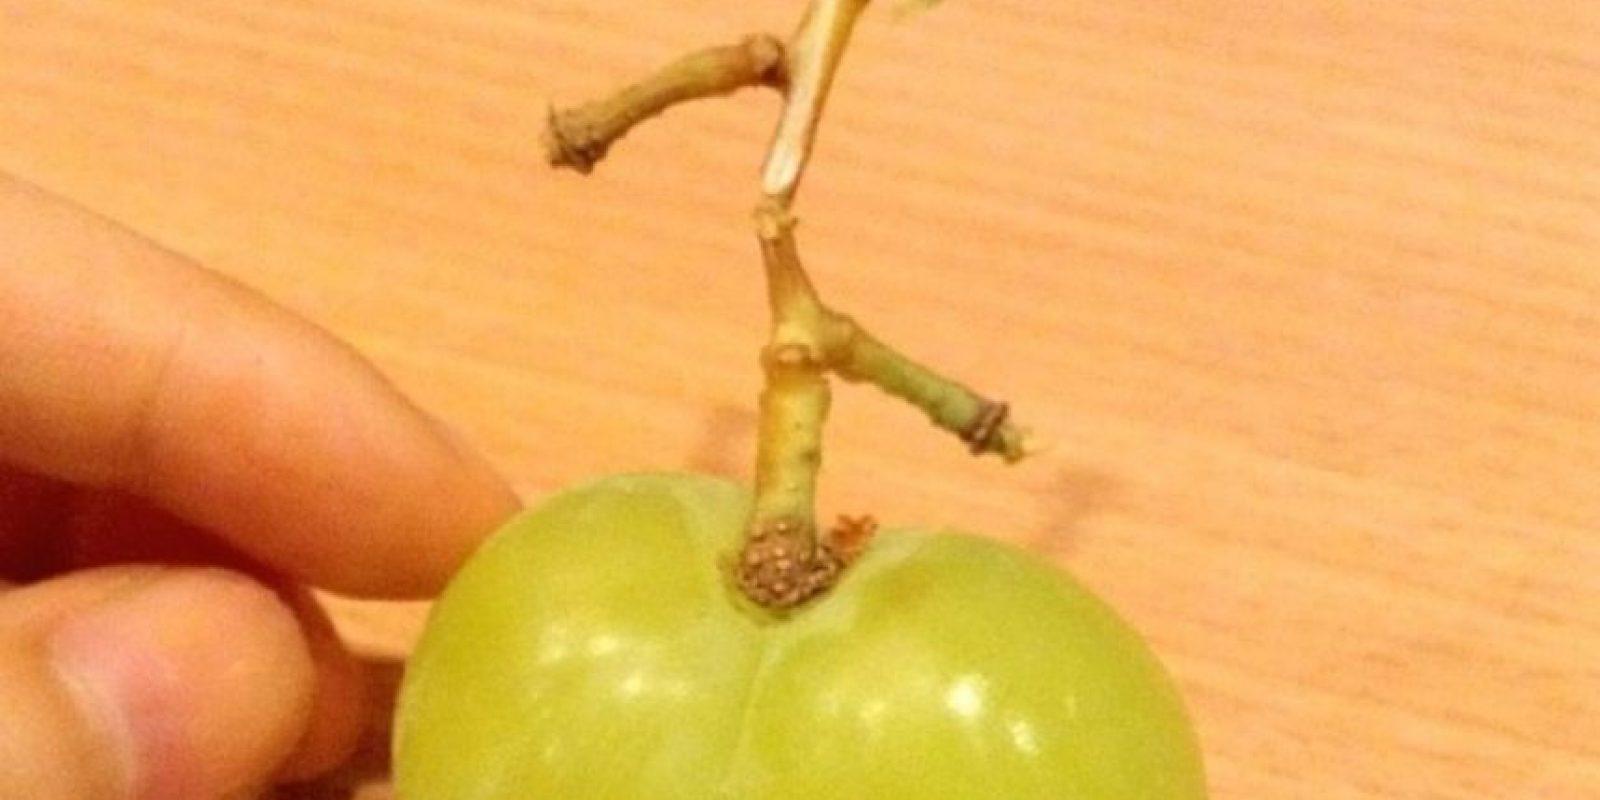 Con uvas Foto:Vía Twitter